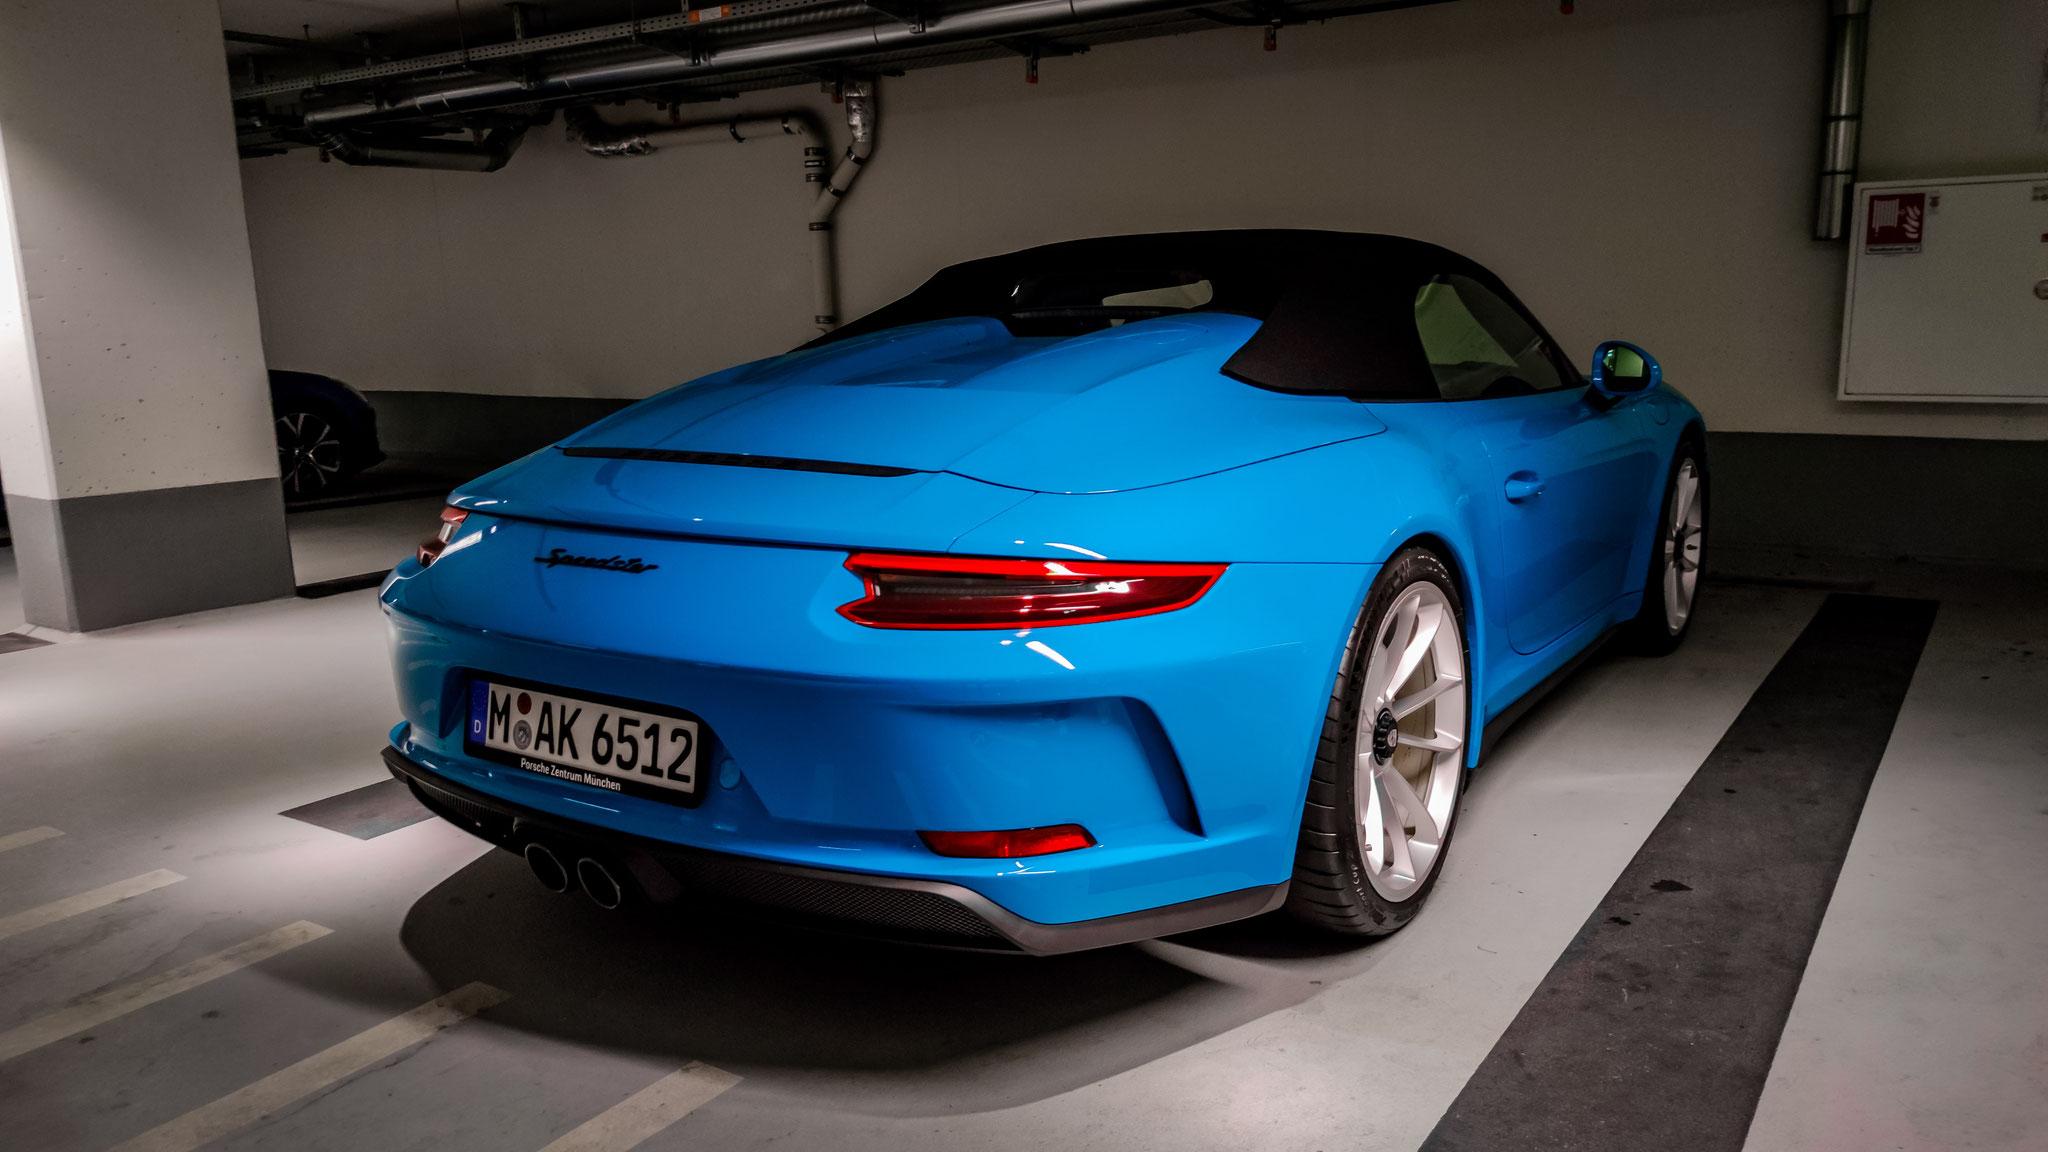 Porsche 991 Speedster - M-AK-6512